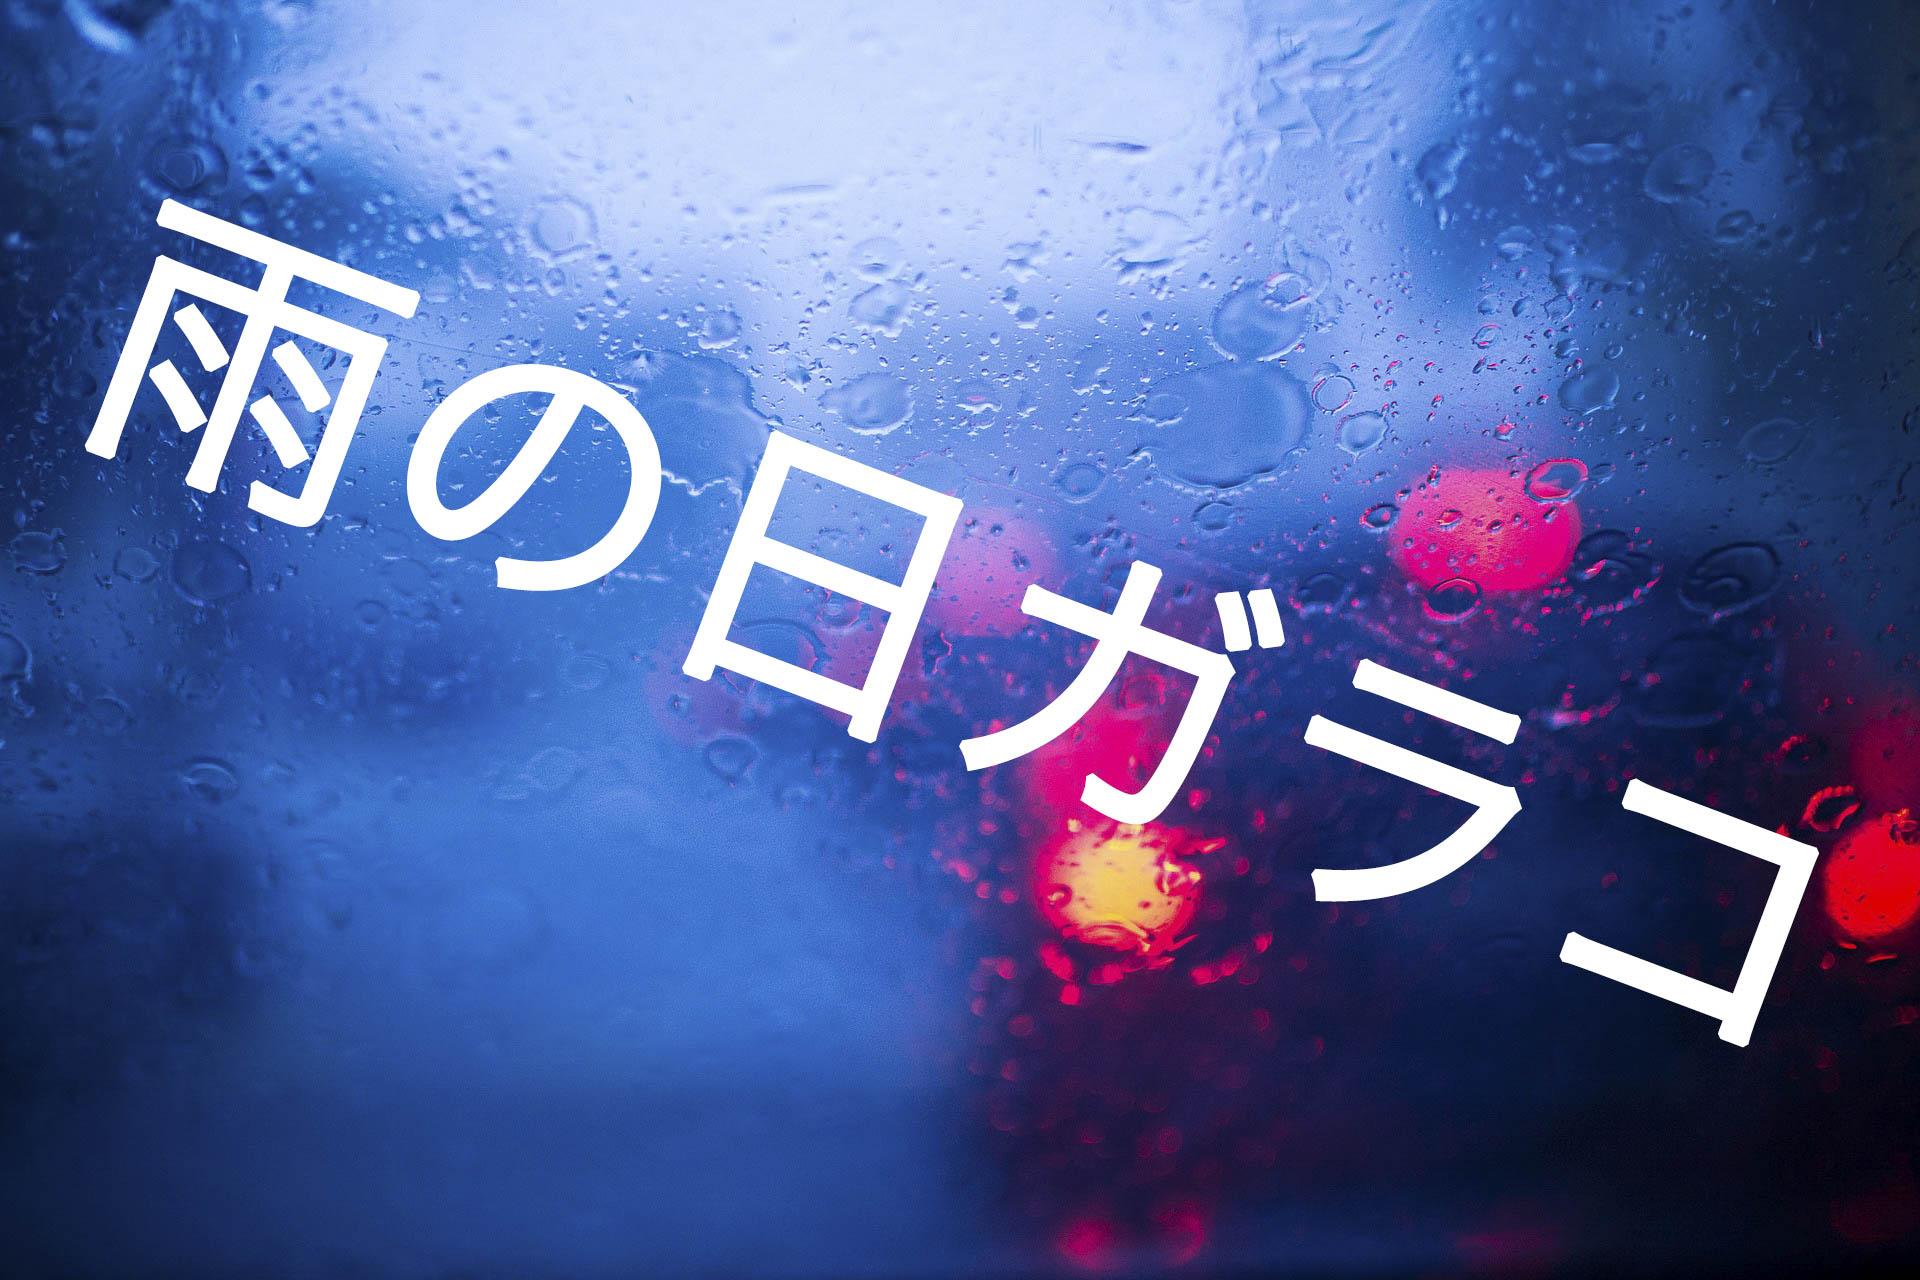 rain-931858_1920